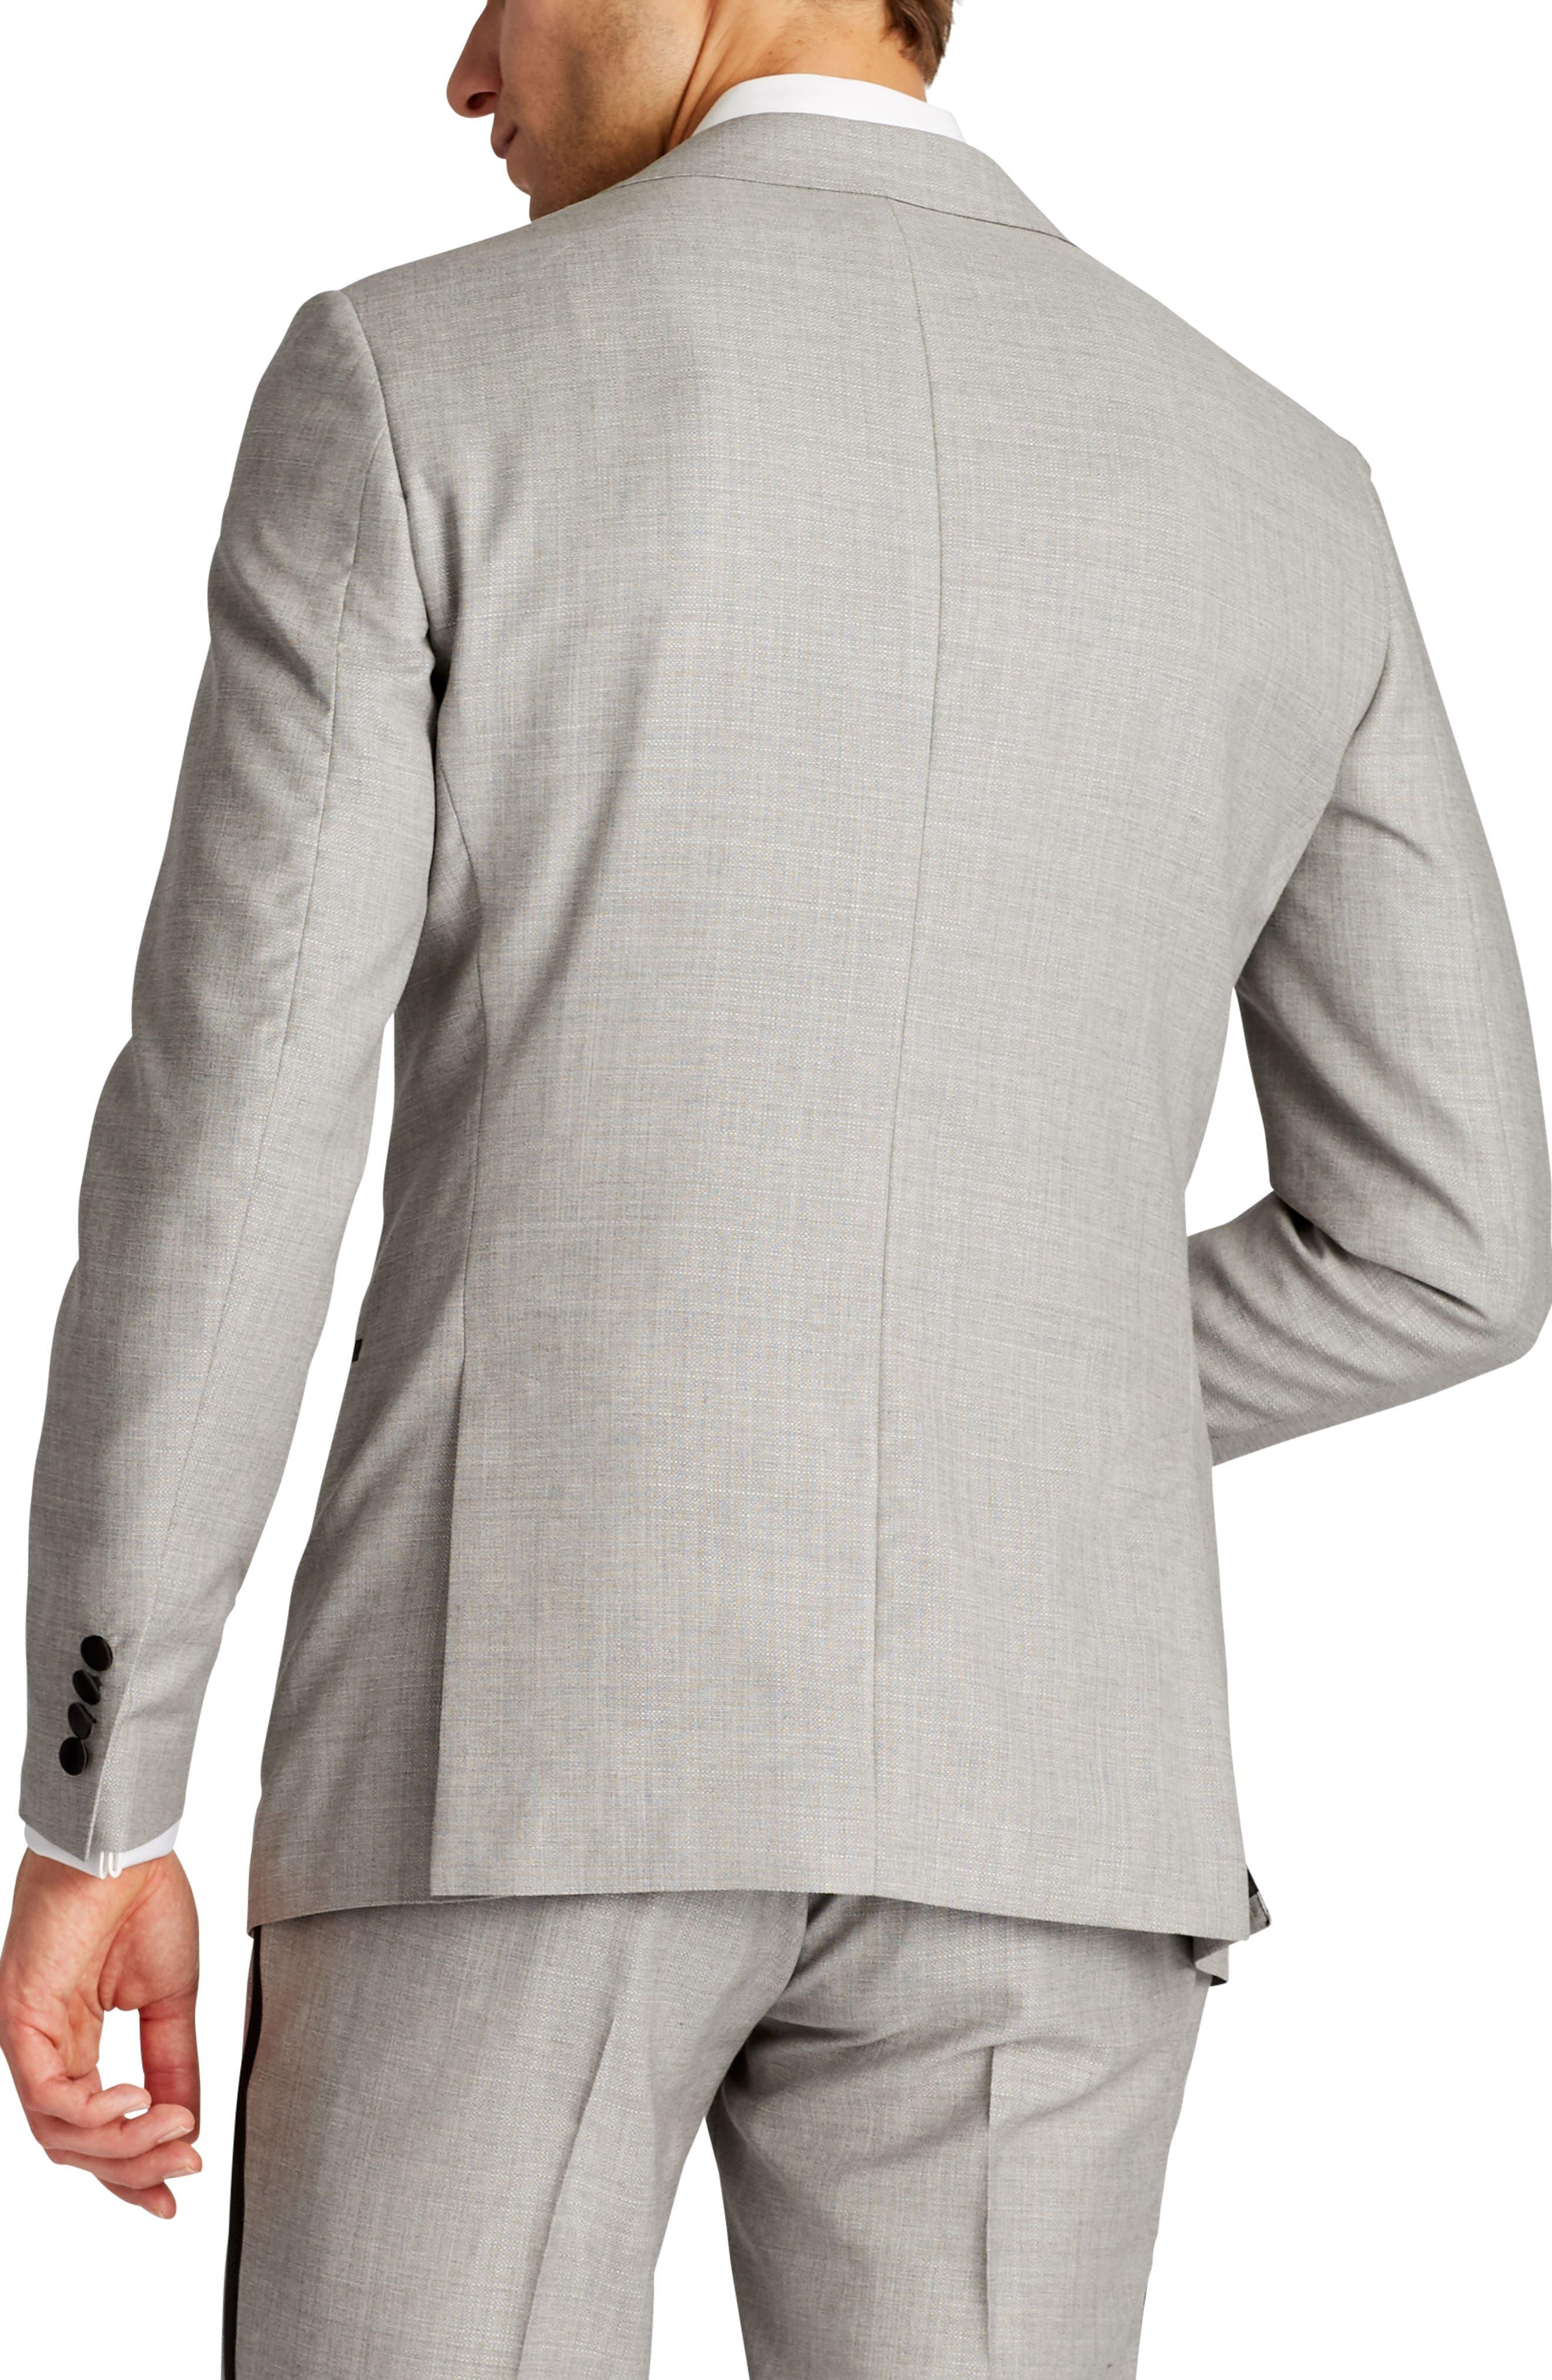 Capstone Slim Fit Wool Dinner Jacket,                             Alternate thumbnail 2, color,                             Pearl Grey